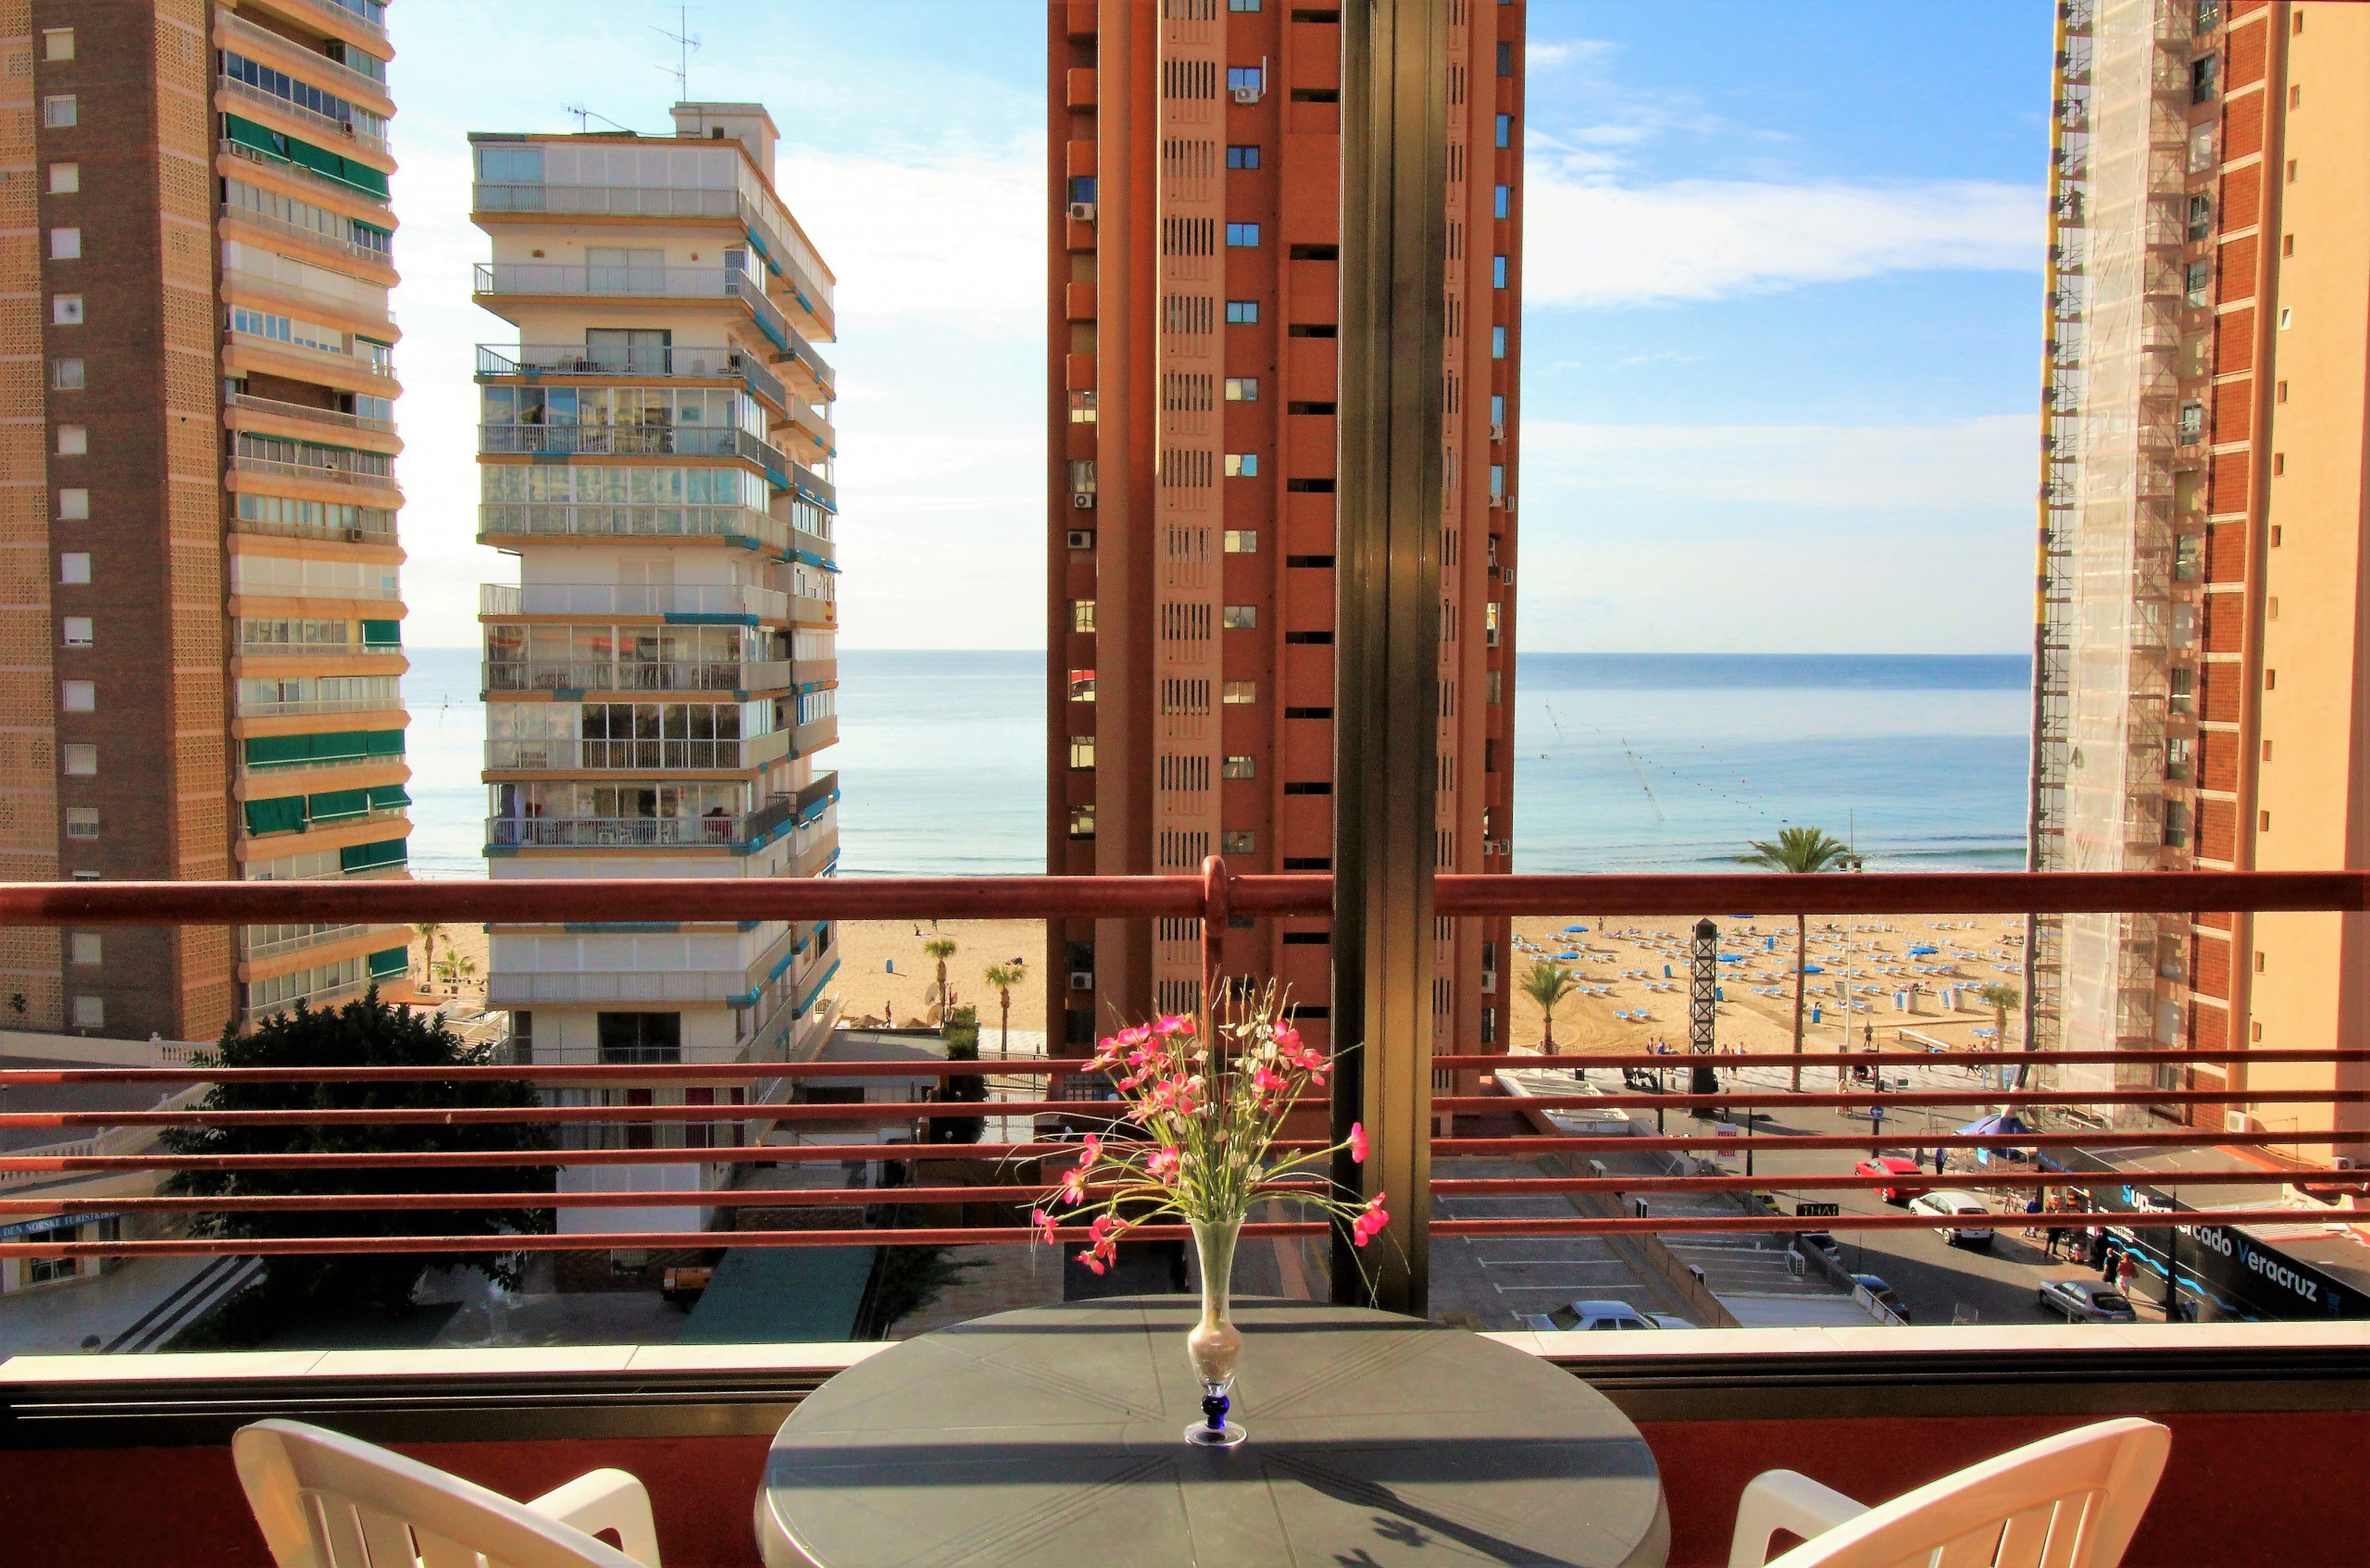 Coblanca 7 - Apartments in Benidorm